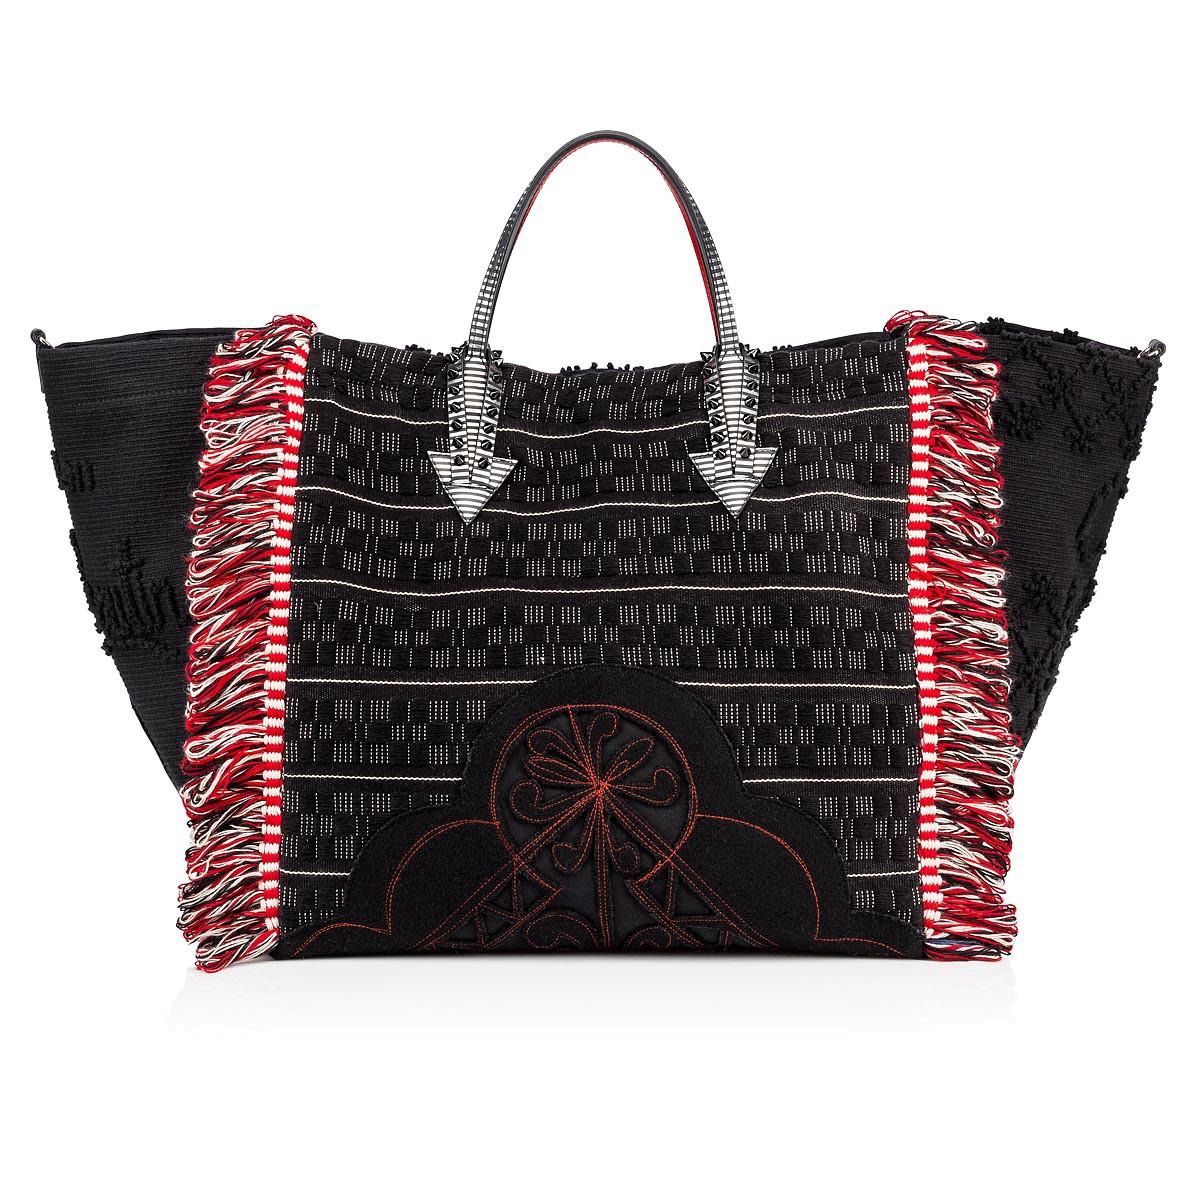 Women Bags - Portugaba - Christian Louboutin